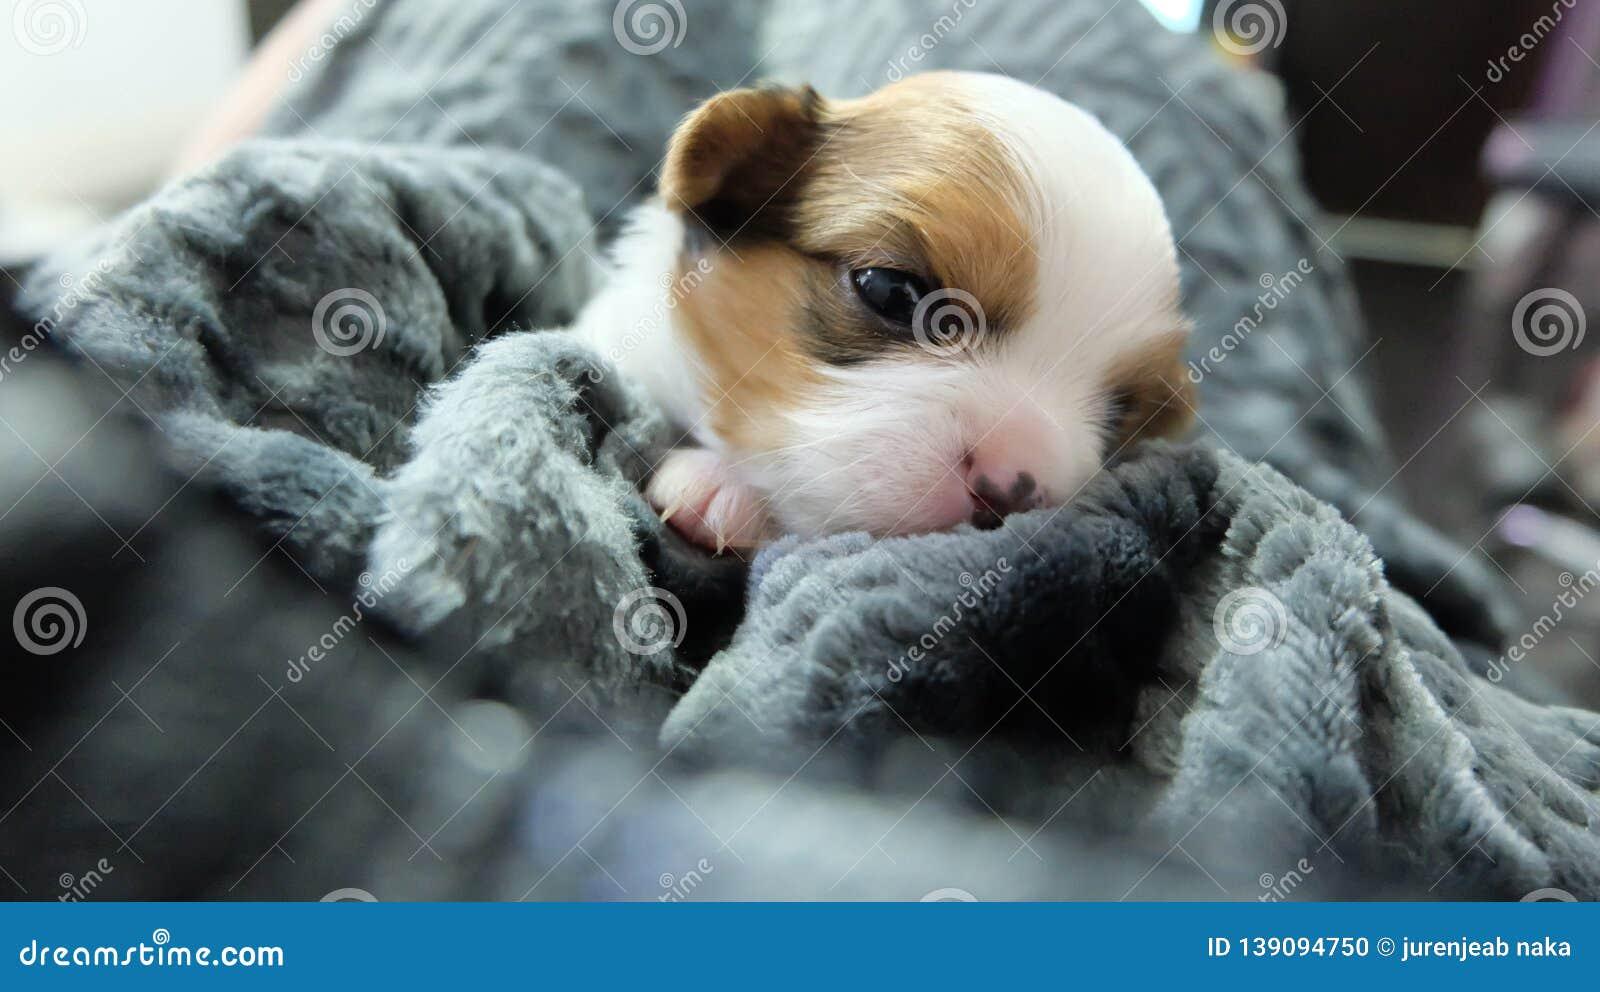 Cute Chihuahua Puppy Stock Photo Image Of Grey Chihuahua 139094750